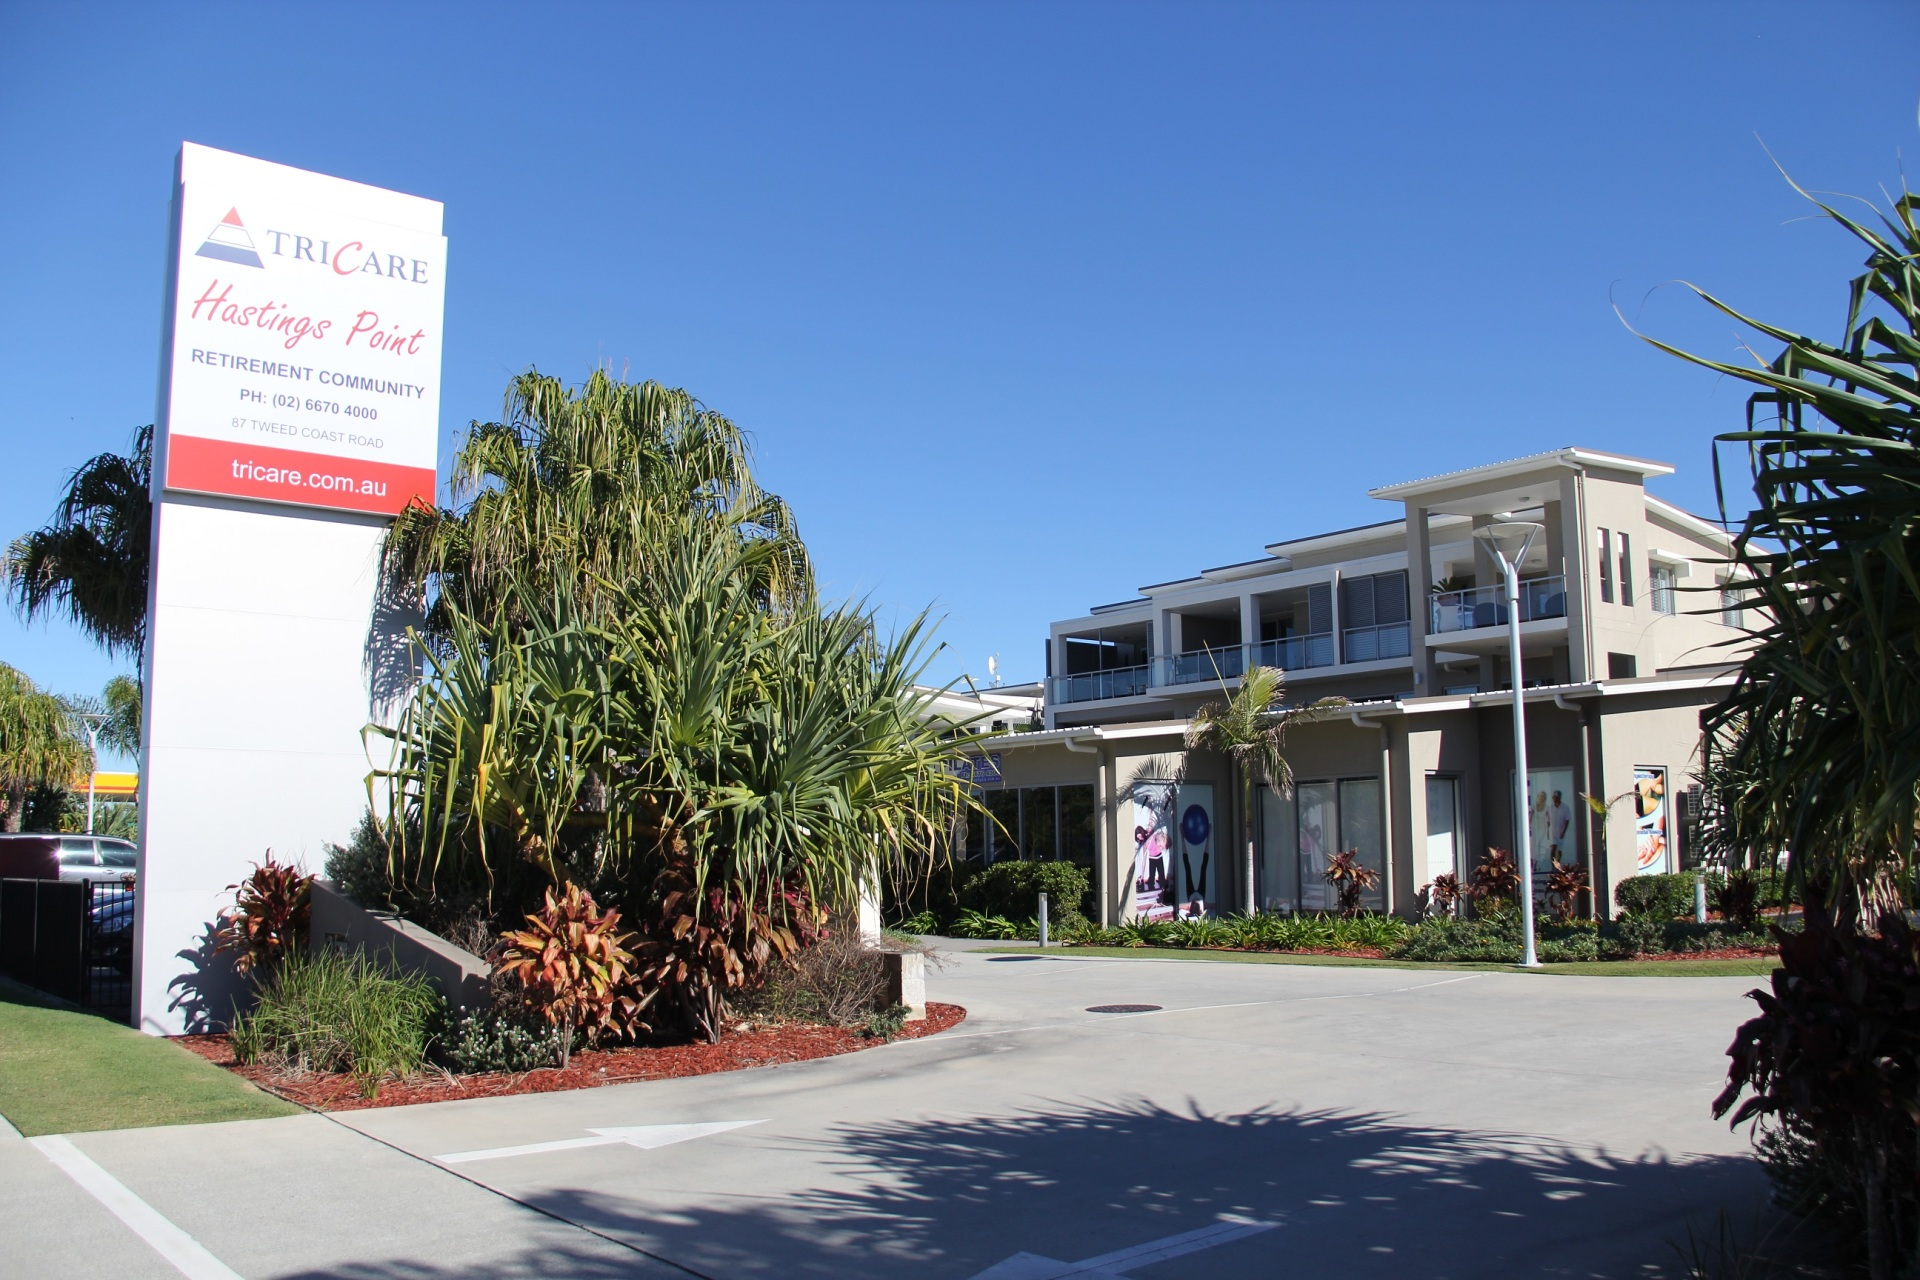 Hastings Point Retirement Community